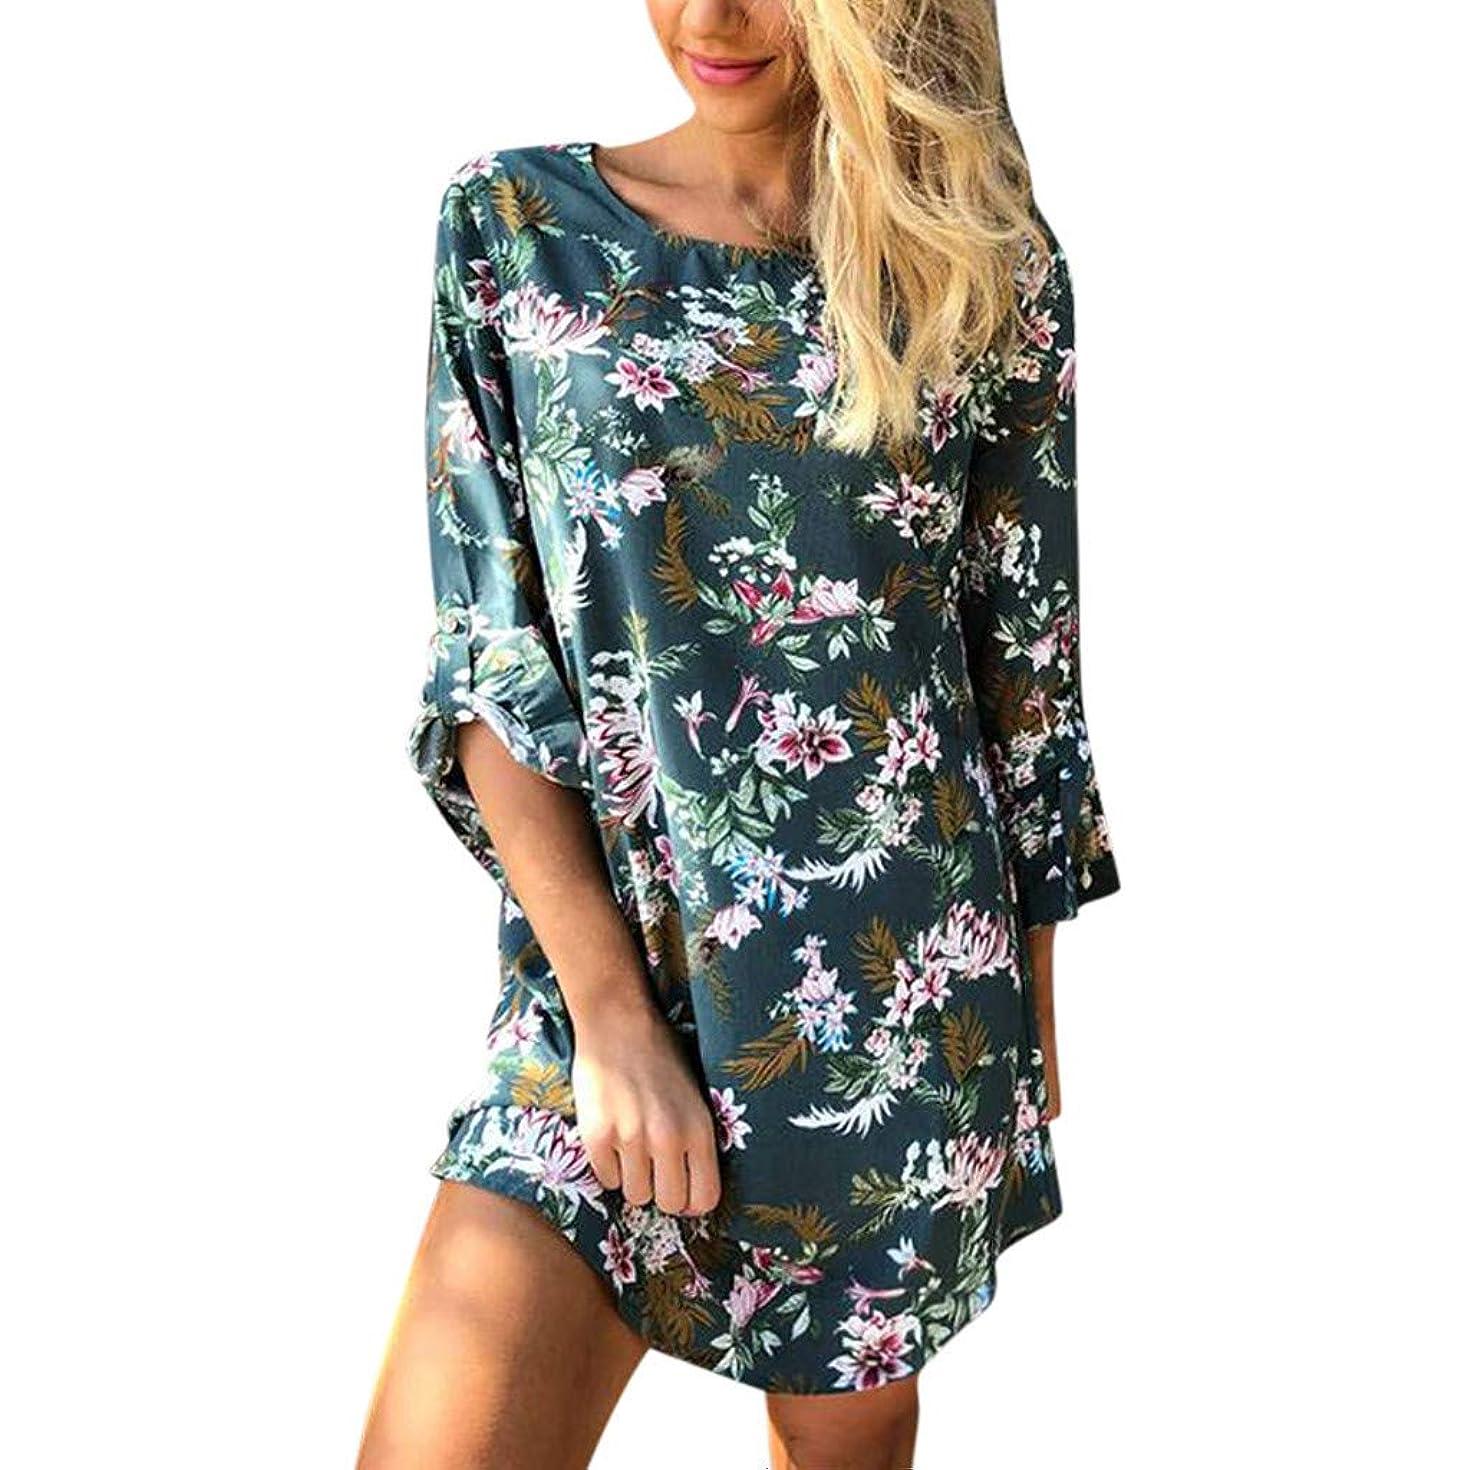 Mini Dresses for Women Summer T Shirt Bohemia Floral Crew Neck Tunics Self-tie Half Sleeves Blouse Dresses